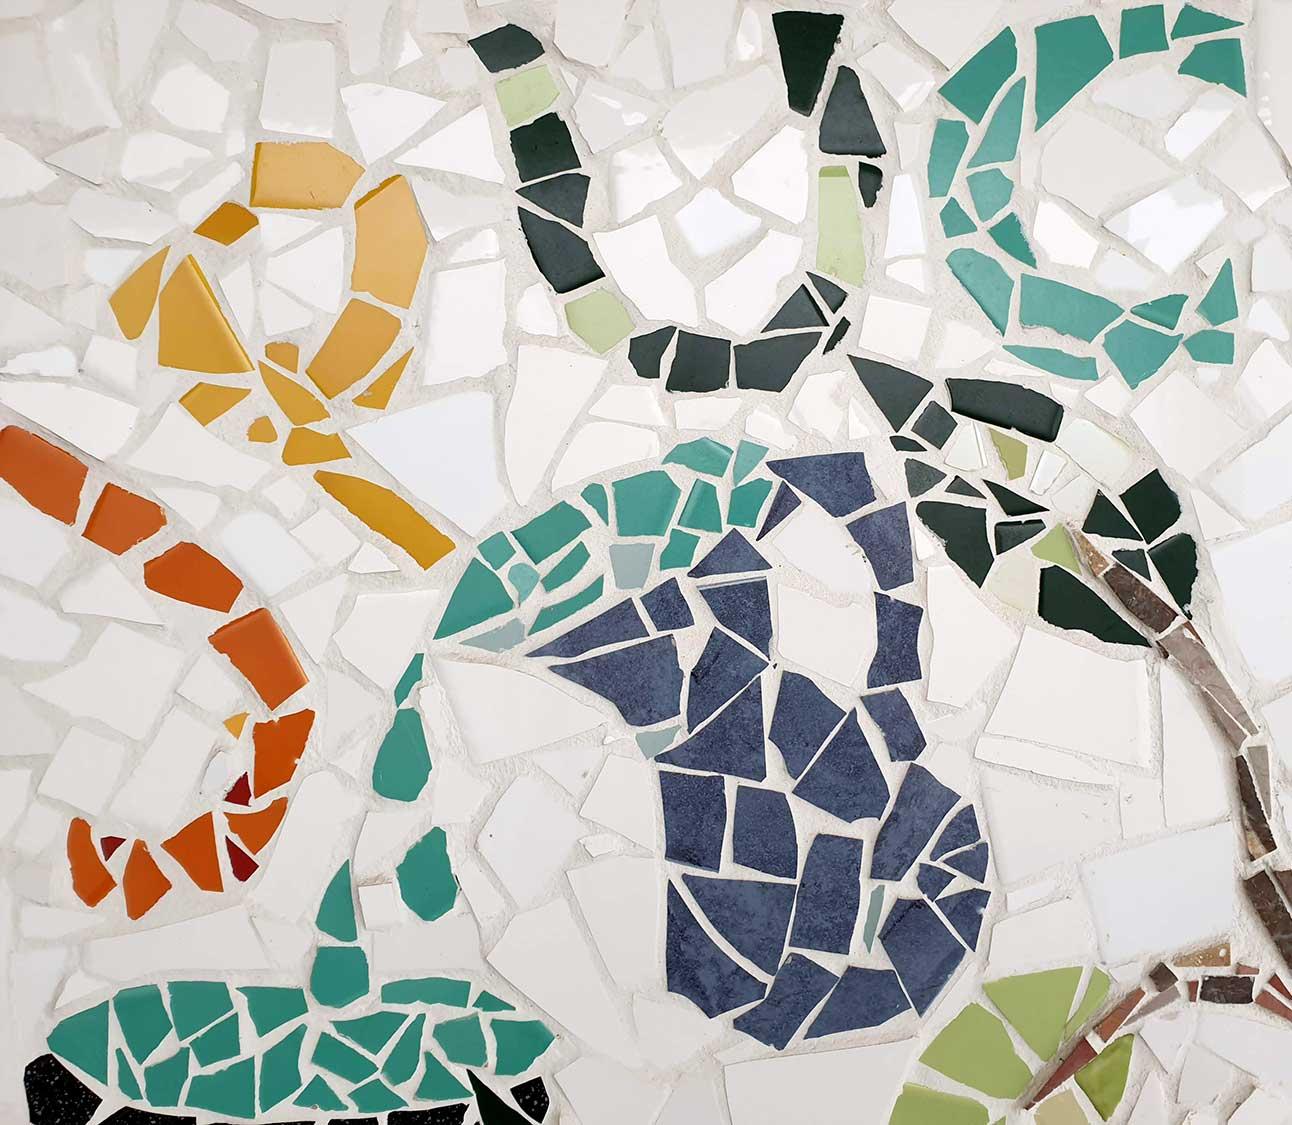 Detail of Jesmond Park UCA mosaic mural showing jug pouring water